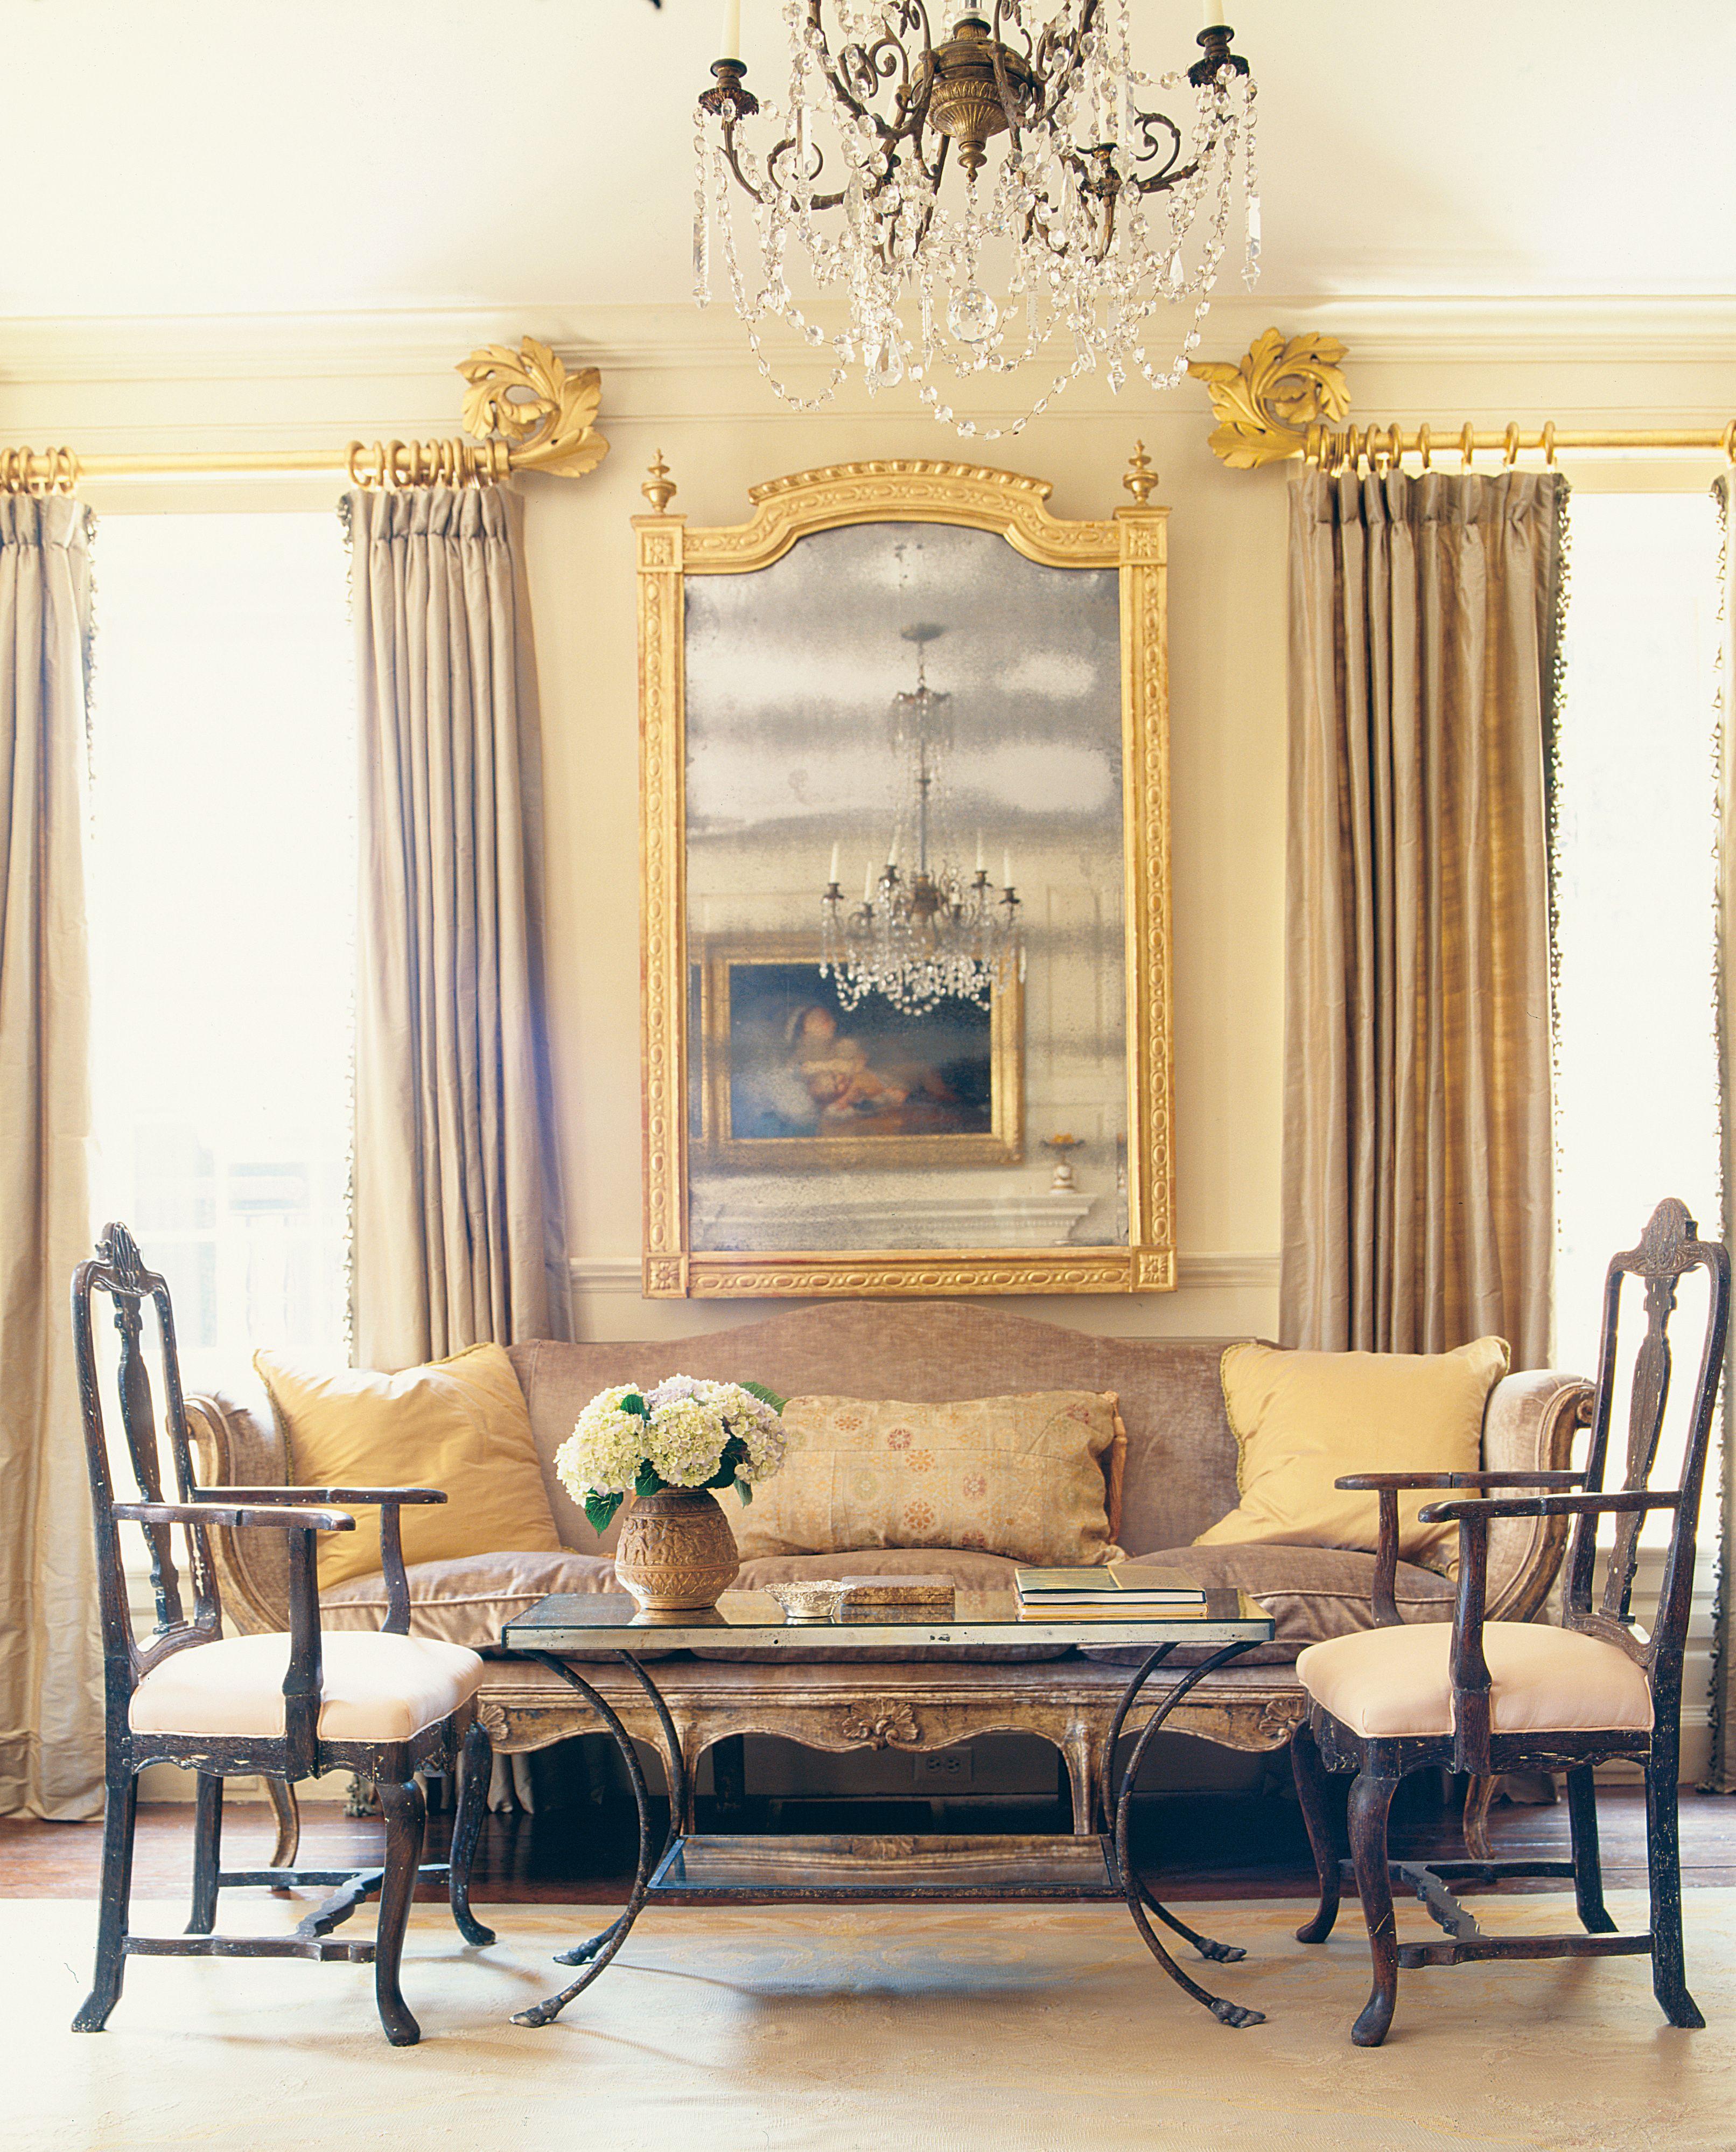 Flower Magazine Jan Feb 2017 Amelia Handegan Blends Fine Antiques With Modern Furniture